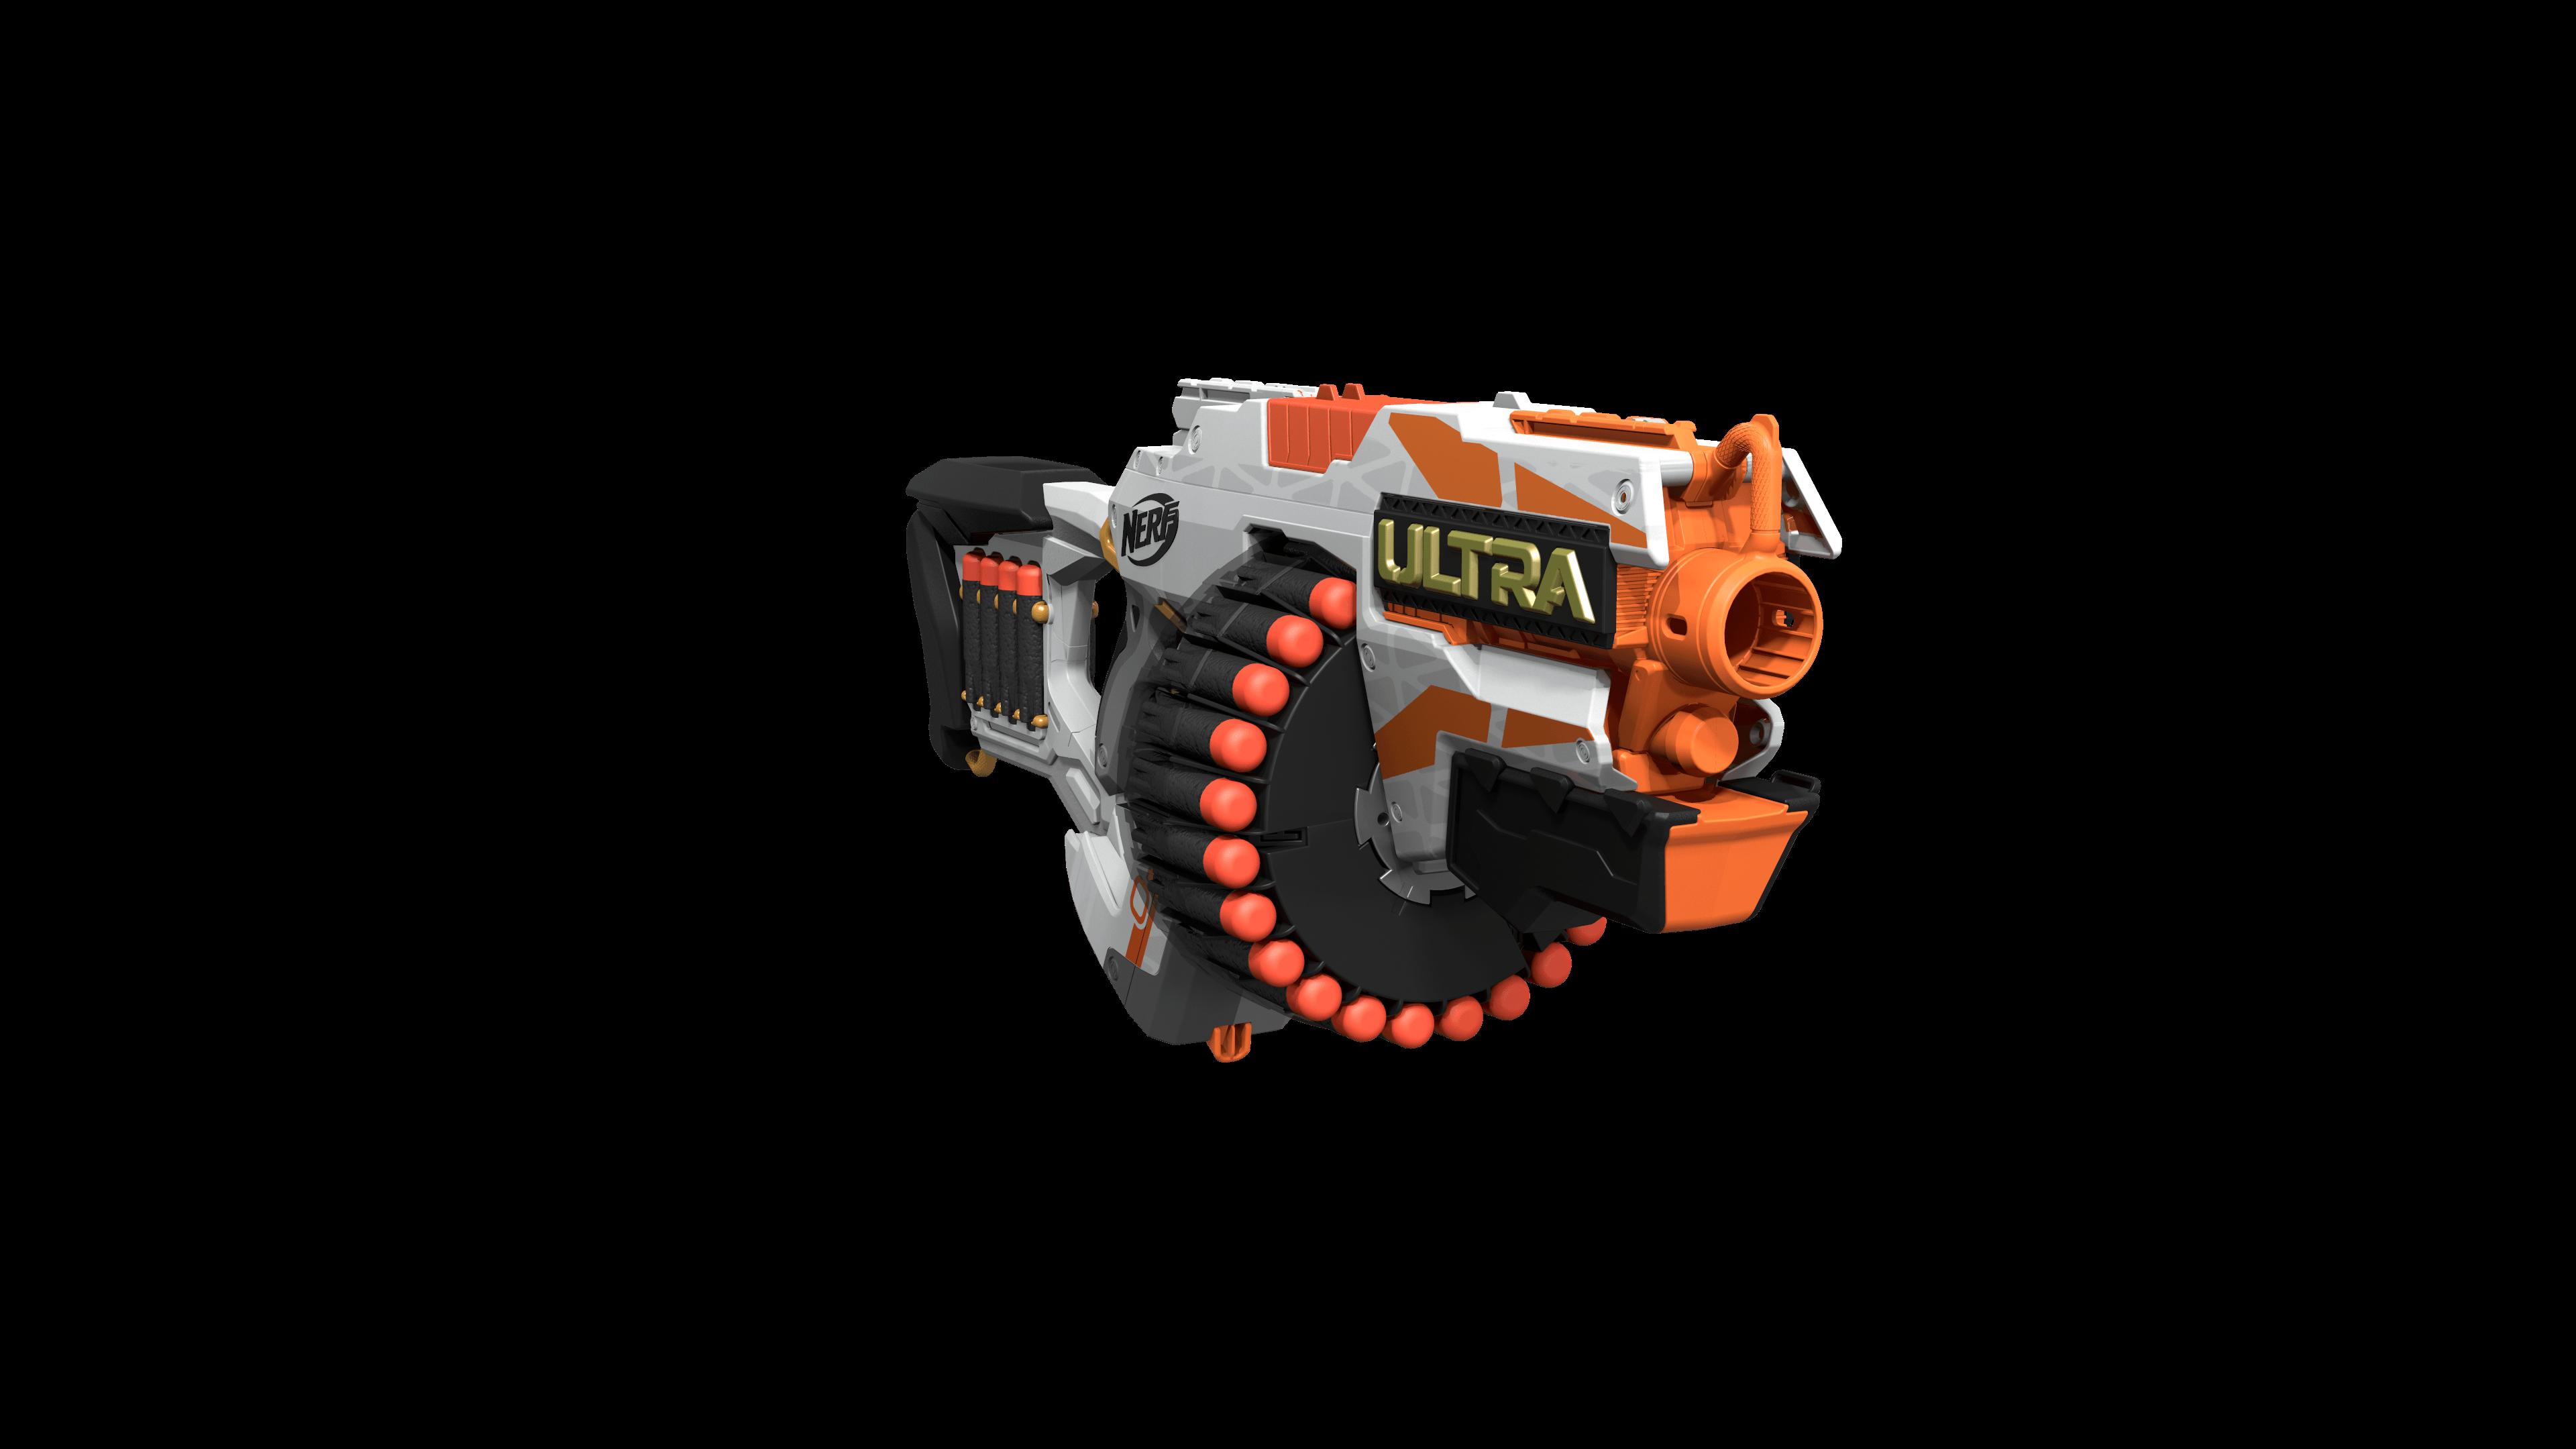 ultra blaster img 101